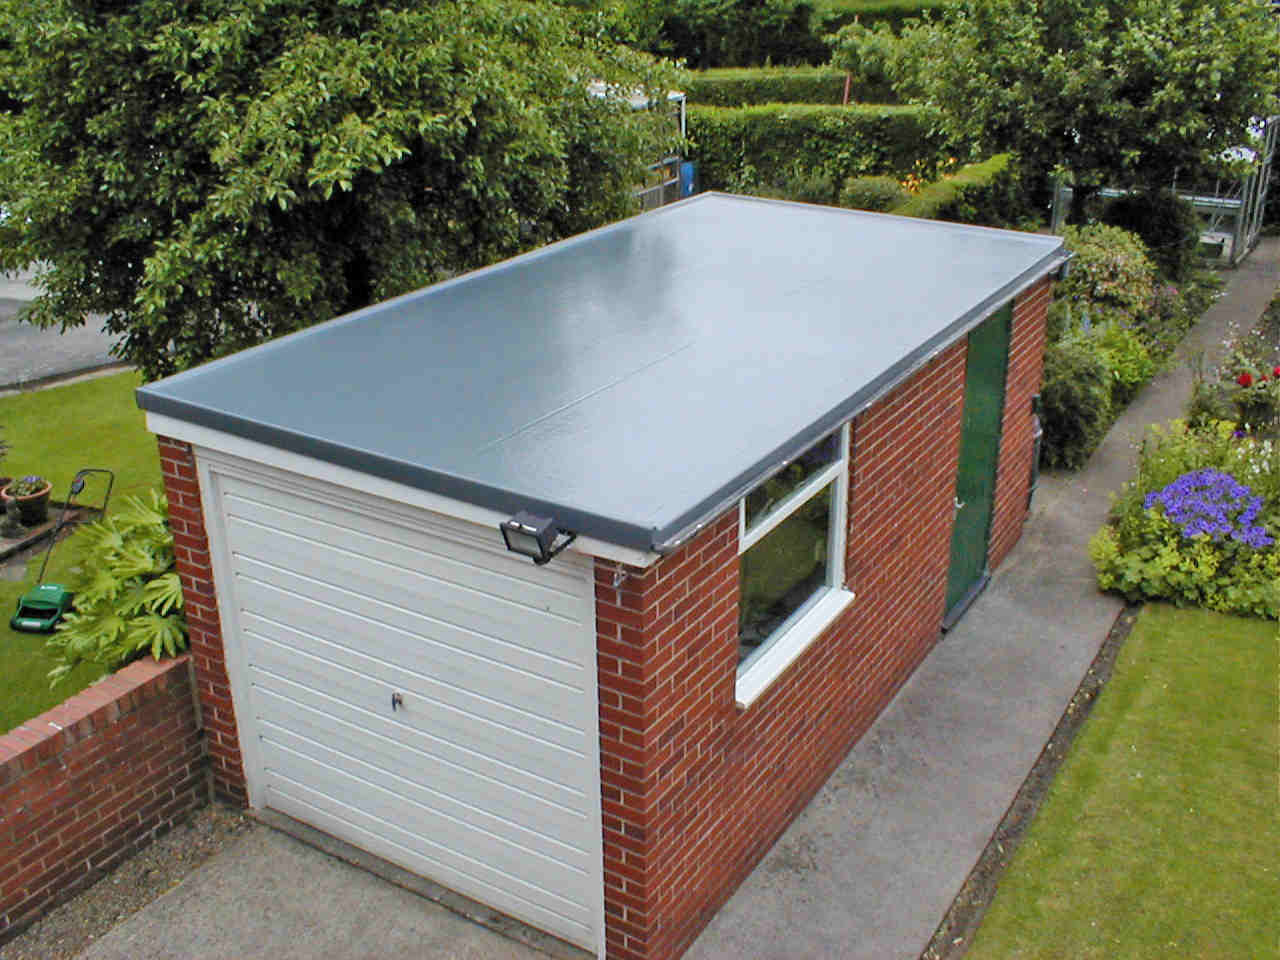 Flat Roof Solutions: How to Fix Cracks